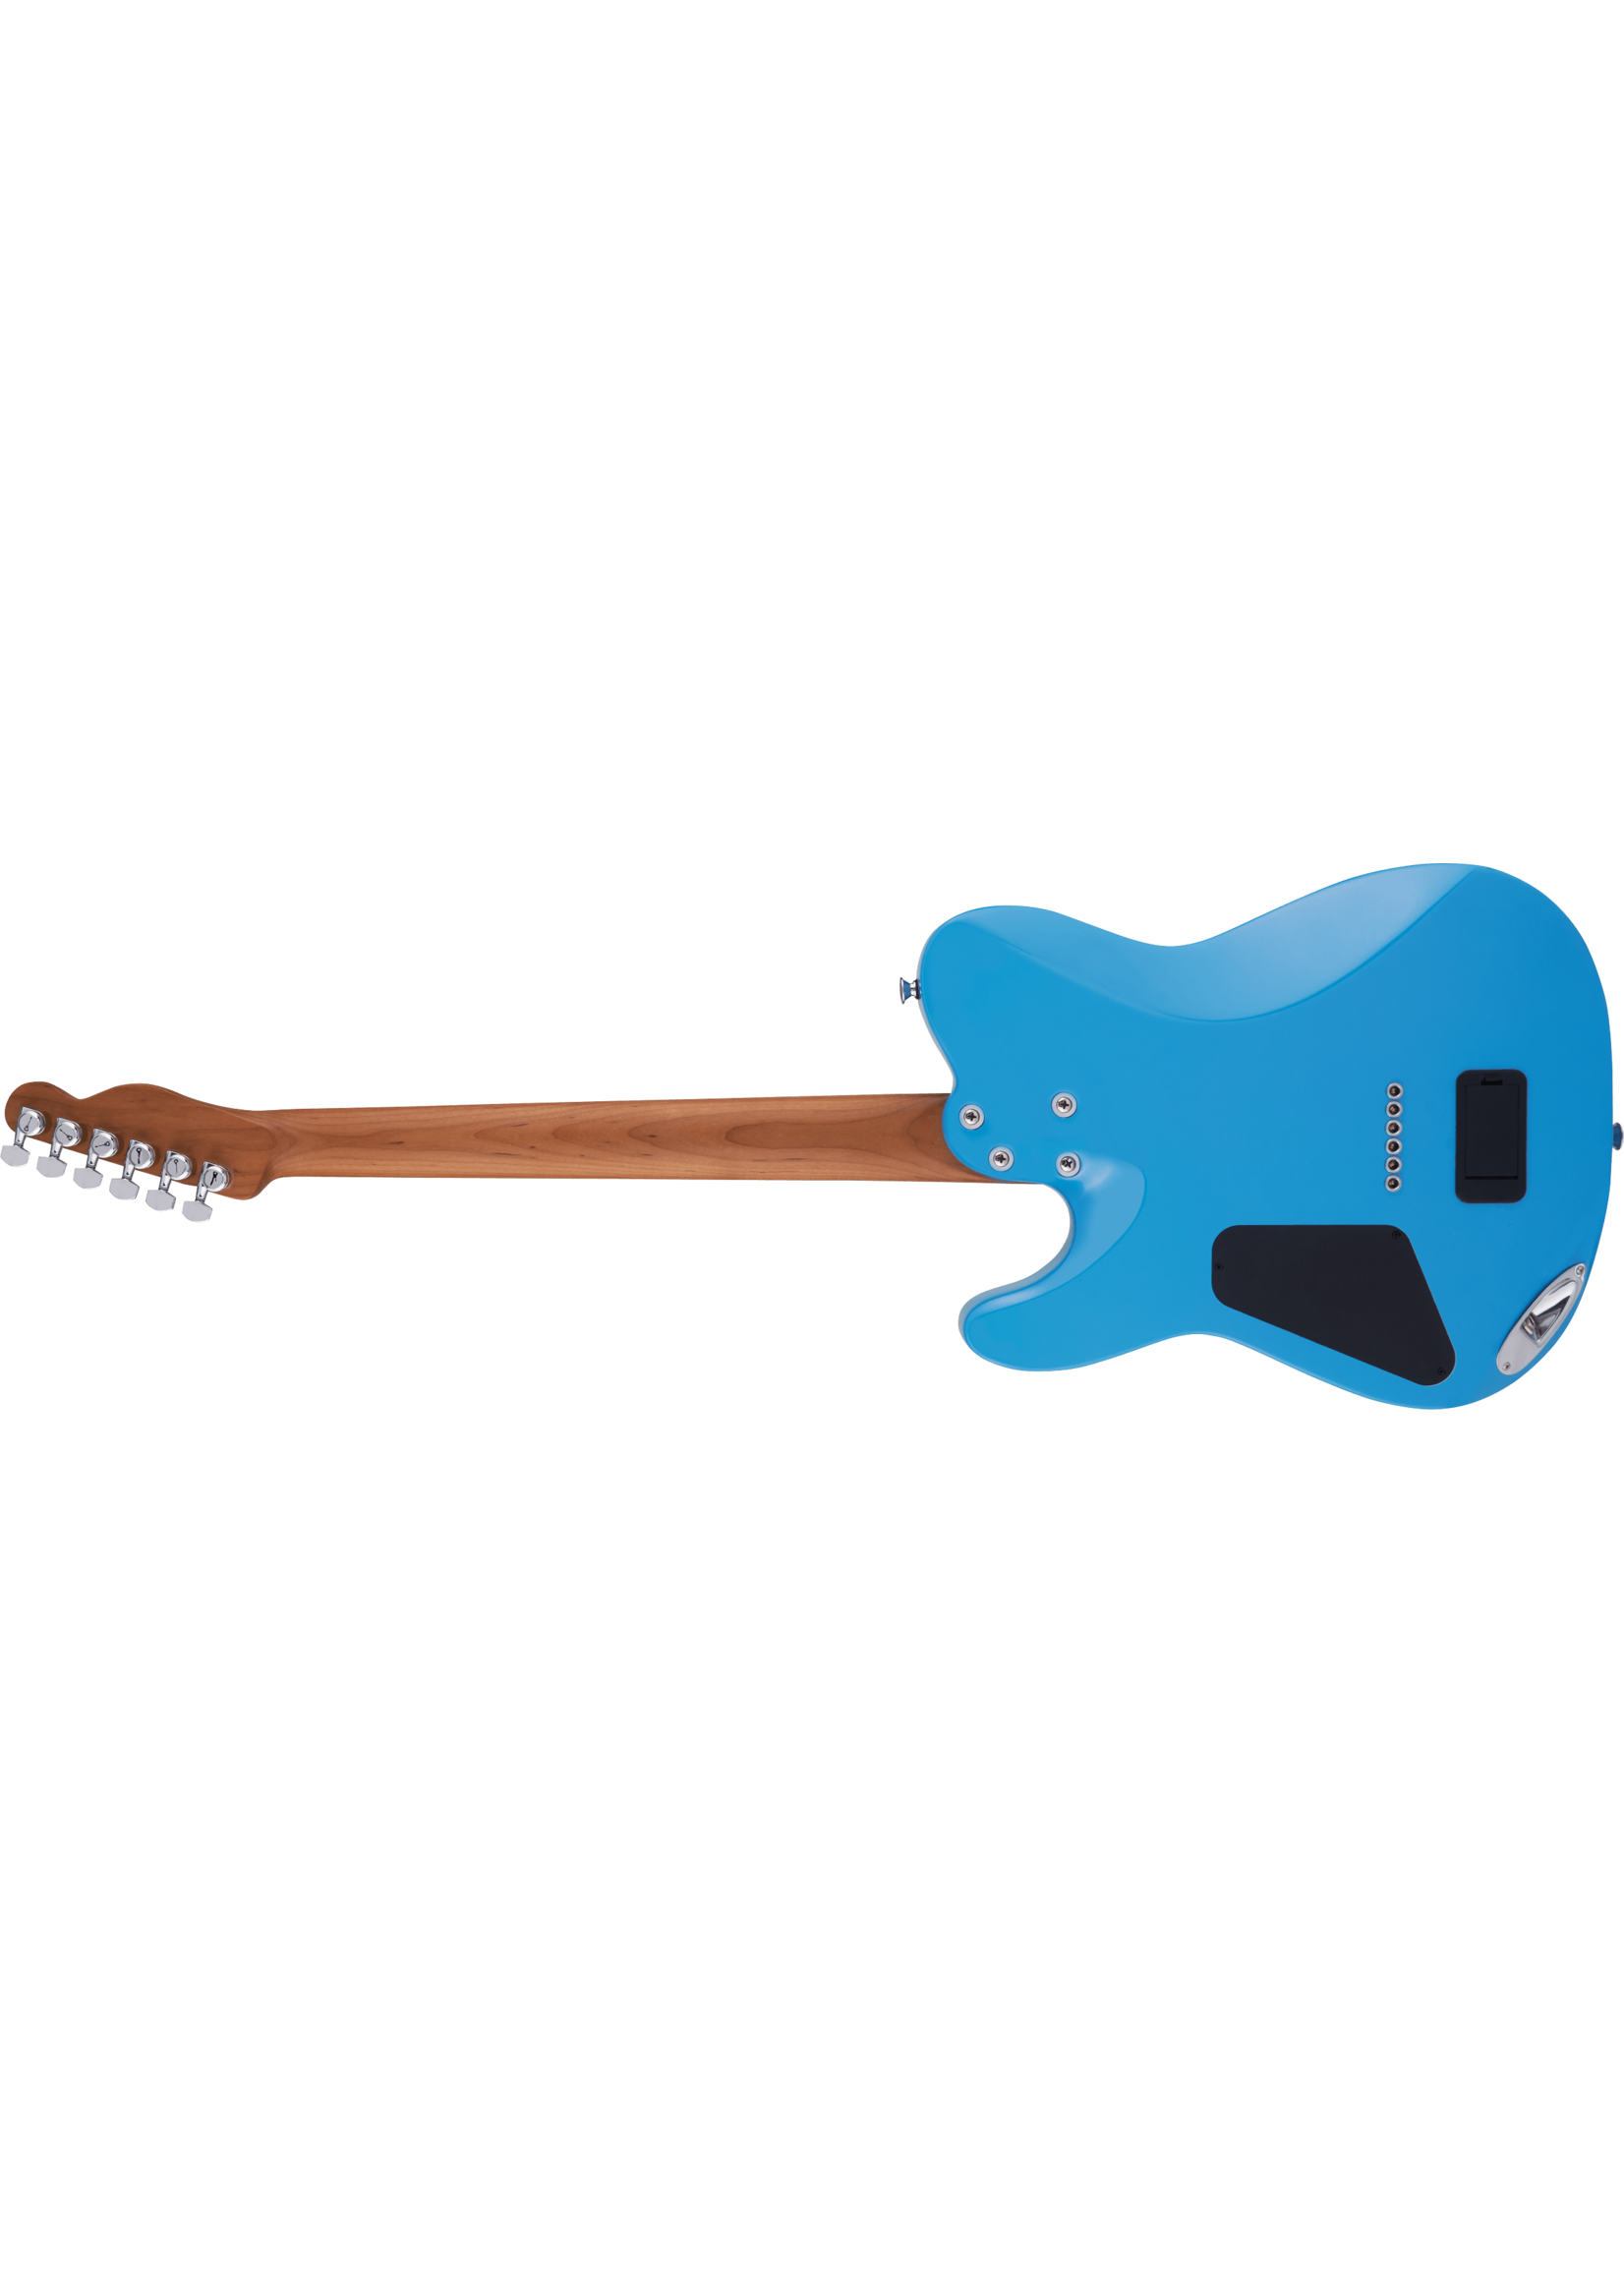 Charvel Charvel Pro-Mod So-Cal Style 2 24 HH HT CM Robin's Egg Blue